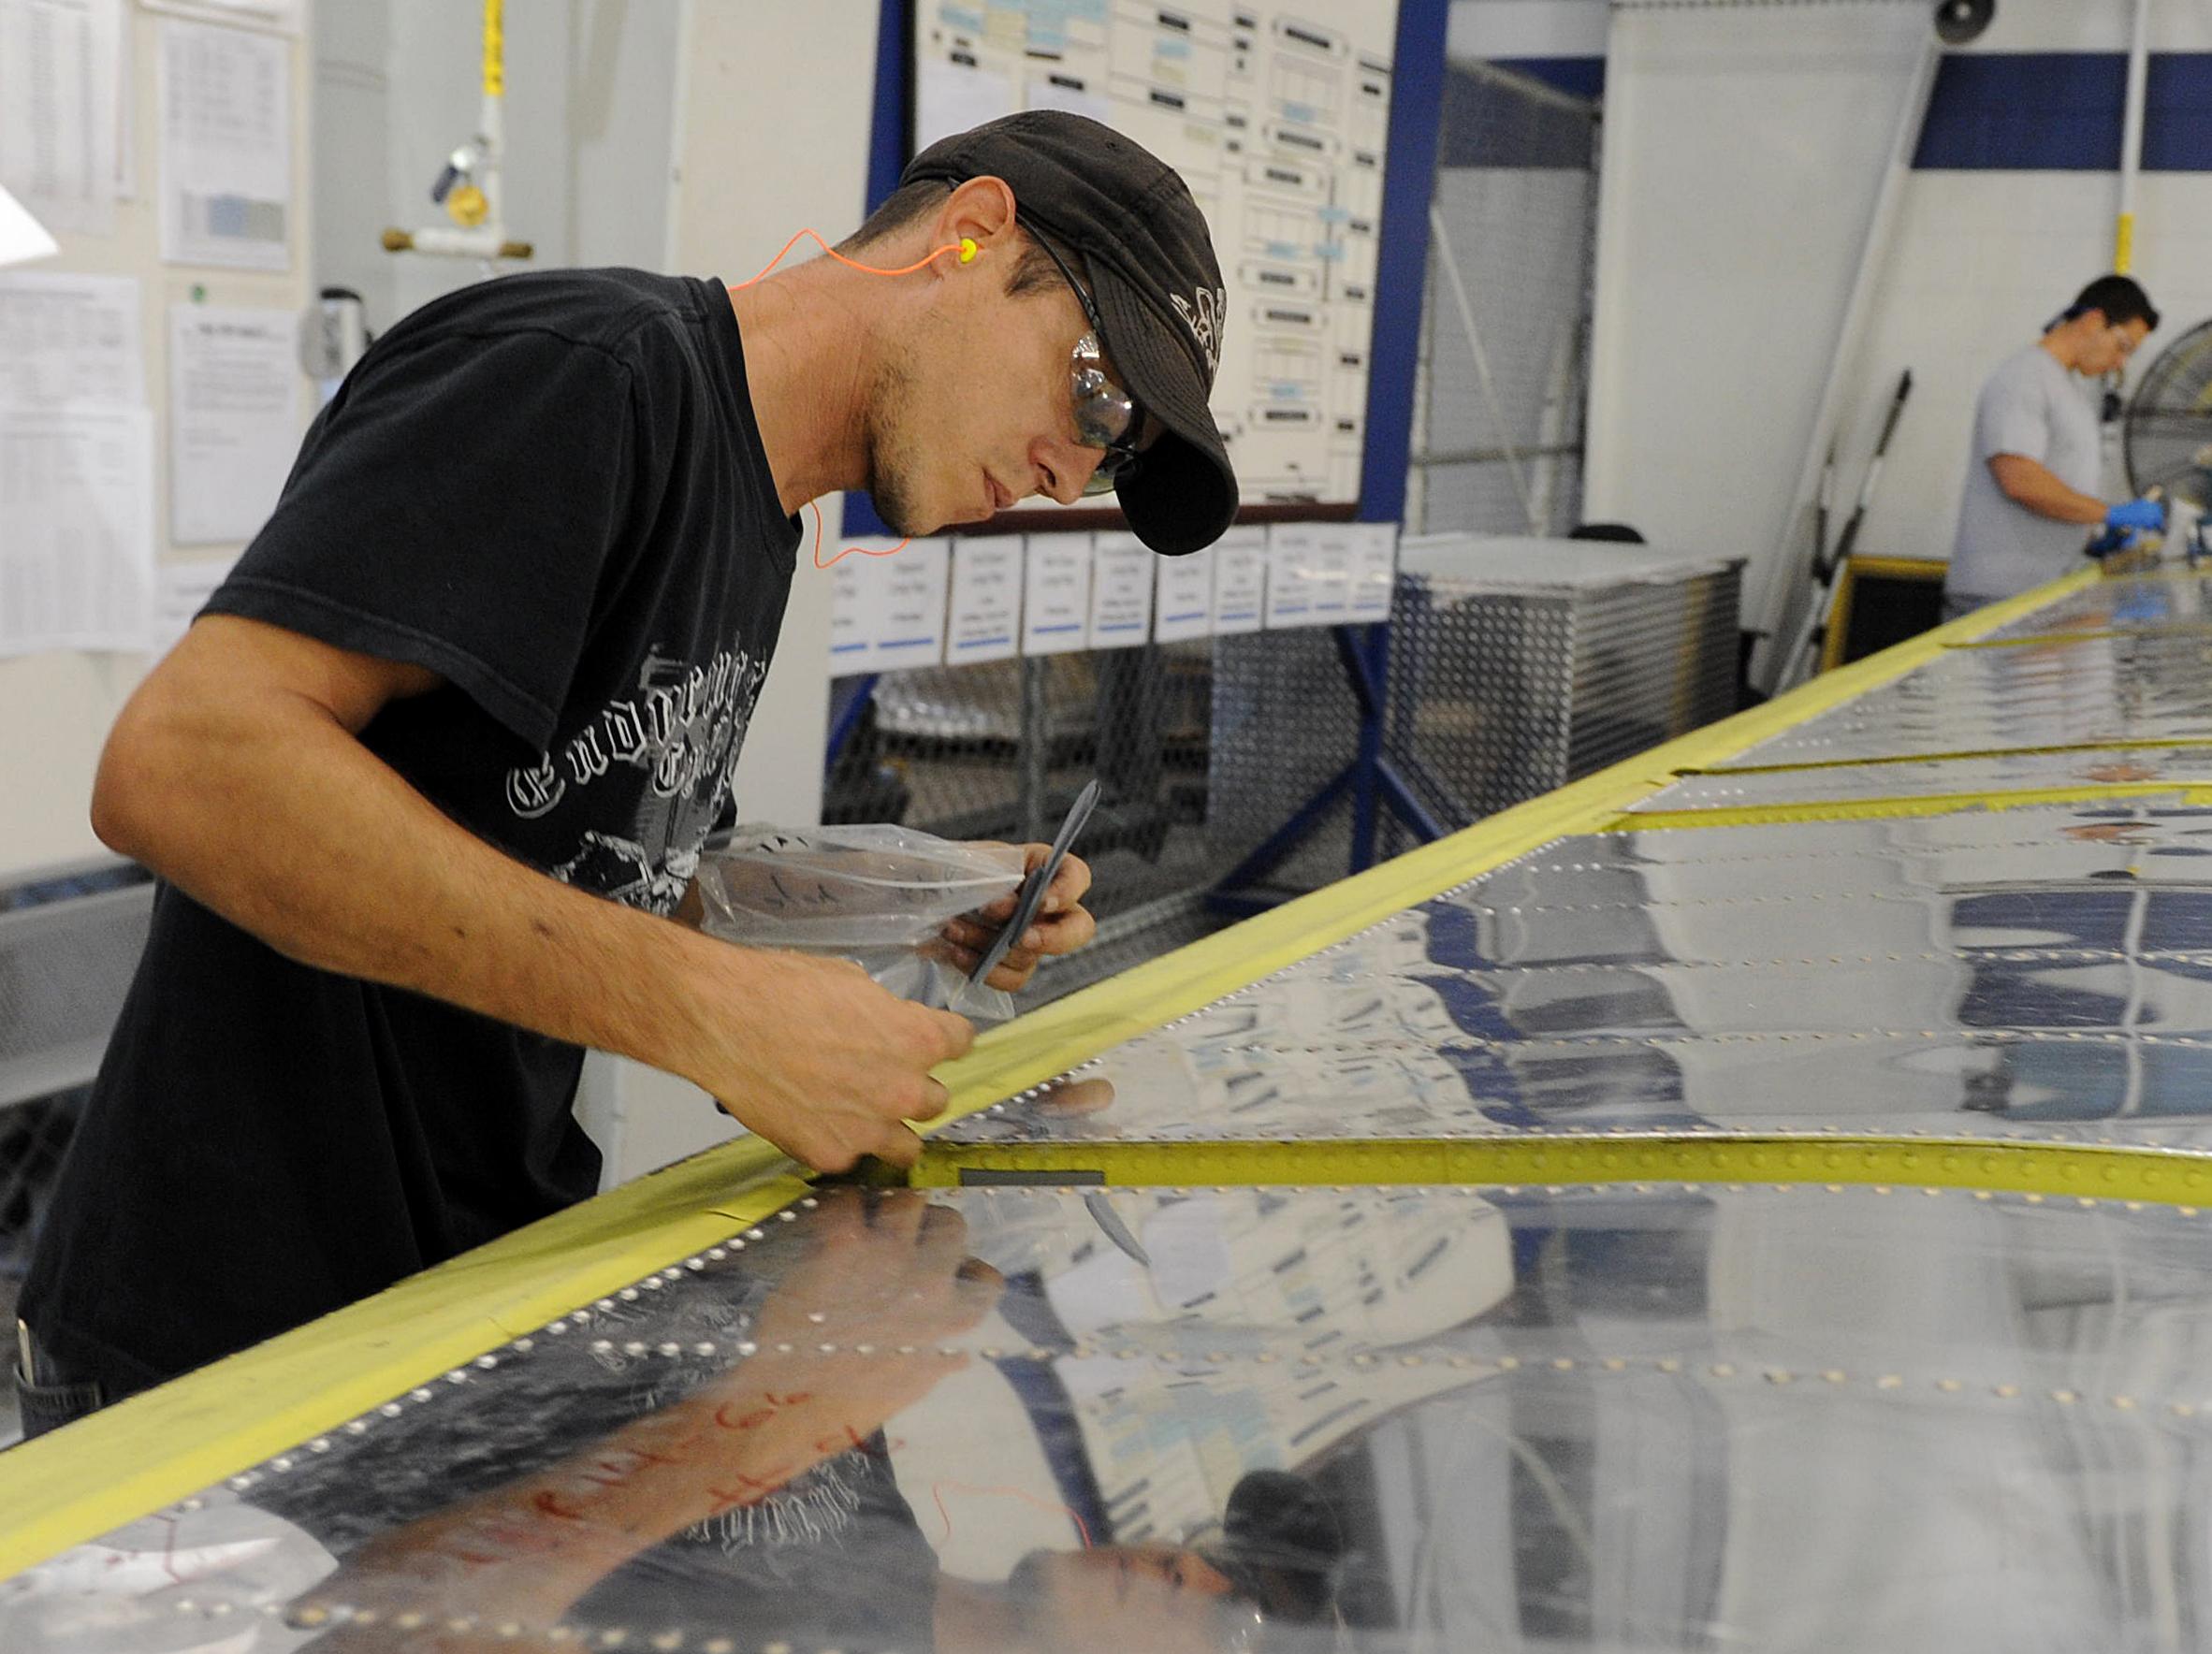 Sheet Metal Manufacturing Process Flow Chart: CMXG C-130 long flaps shop highlights process discipline e Robins ,Chart